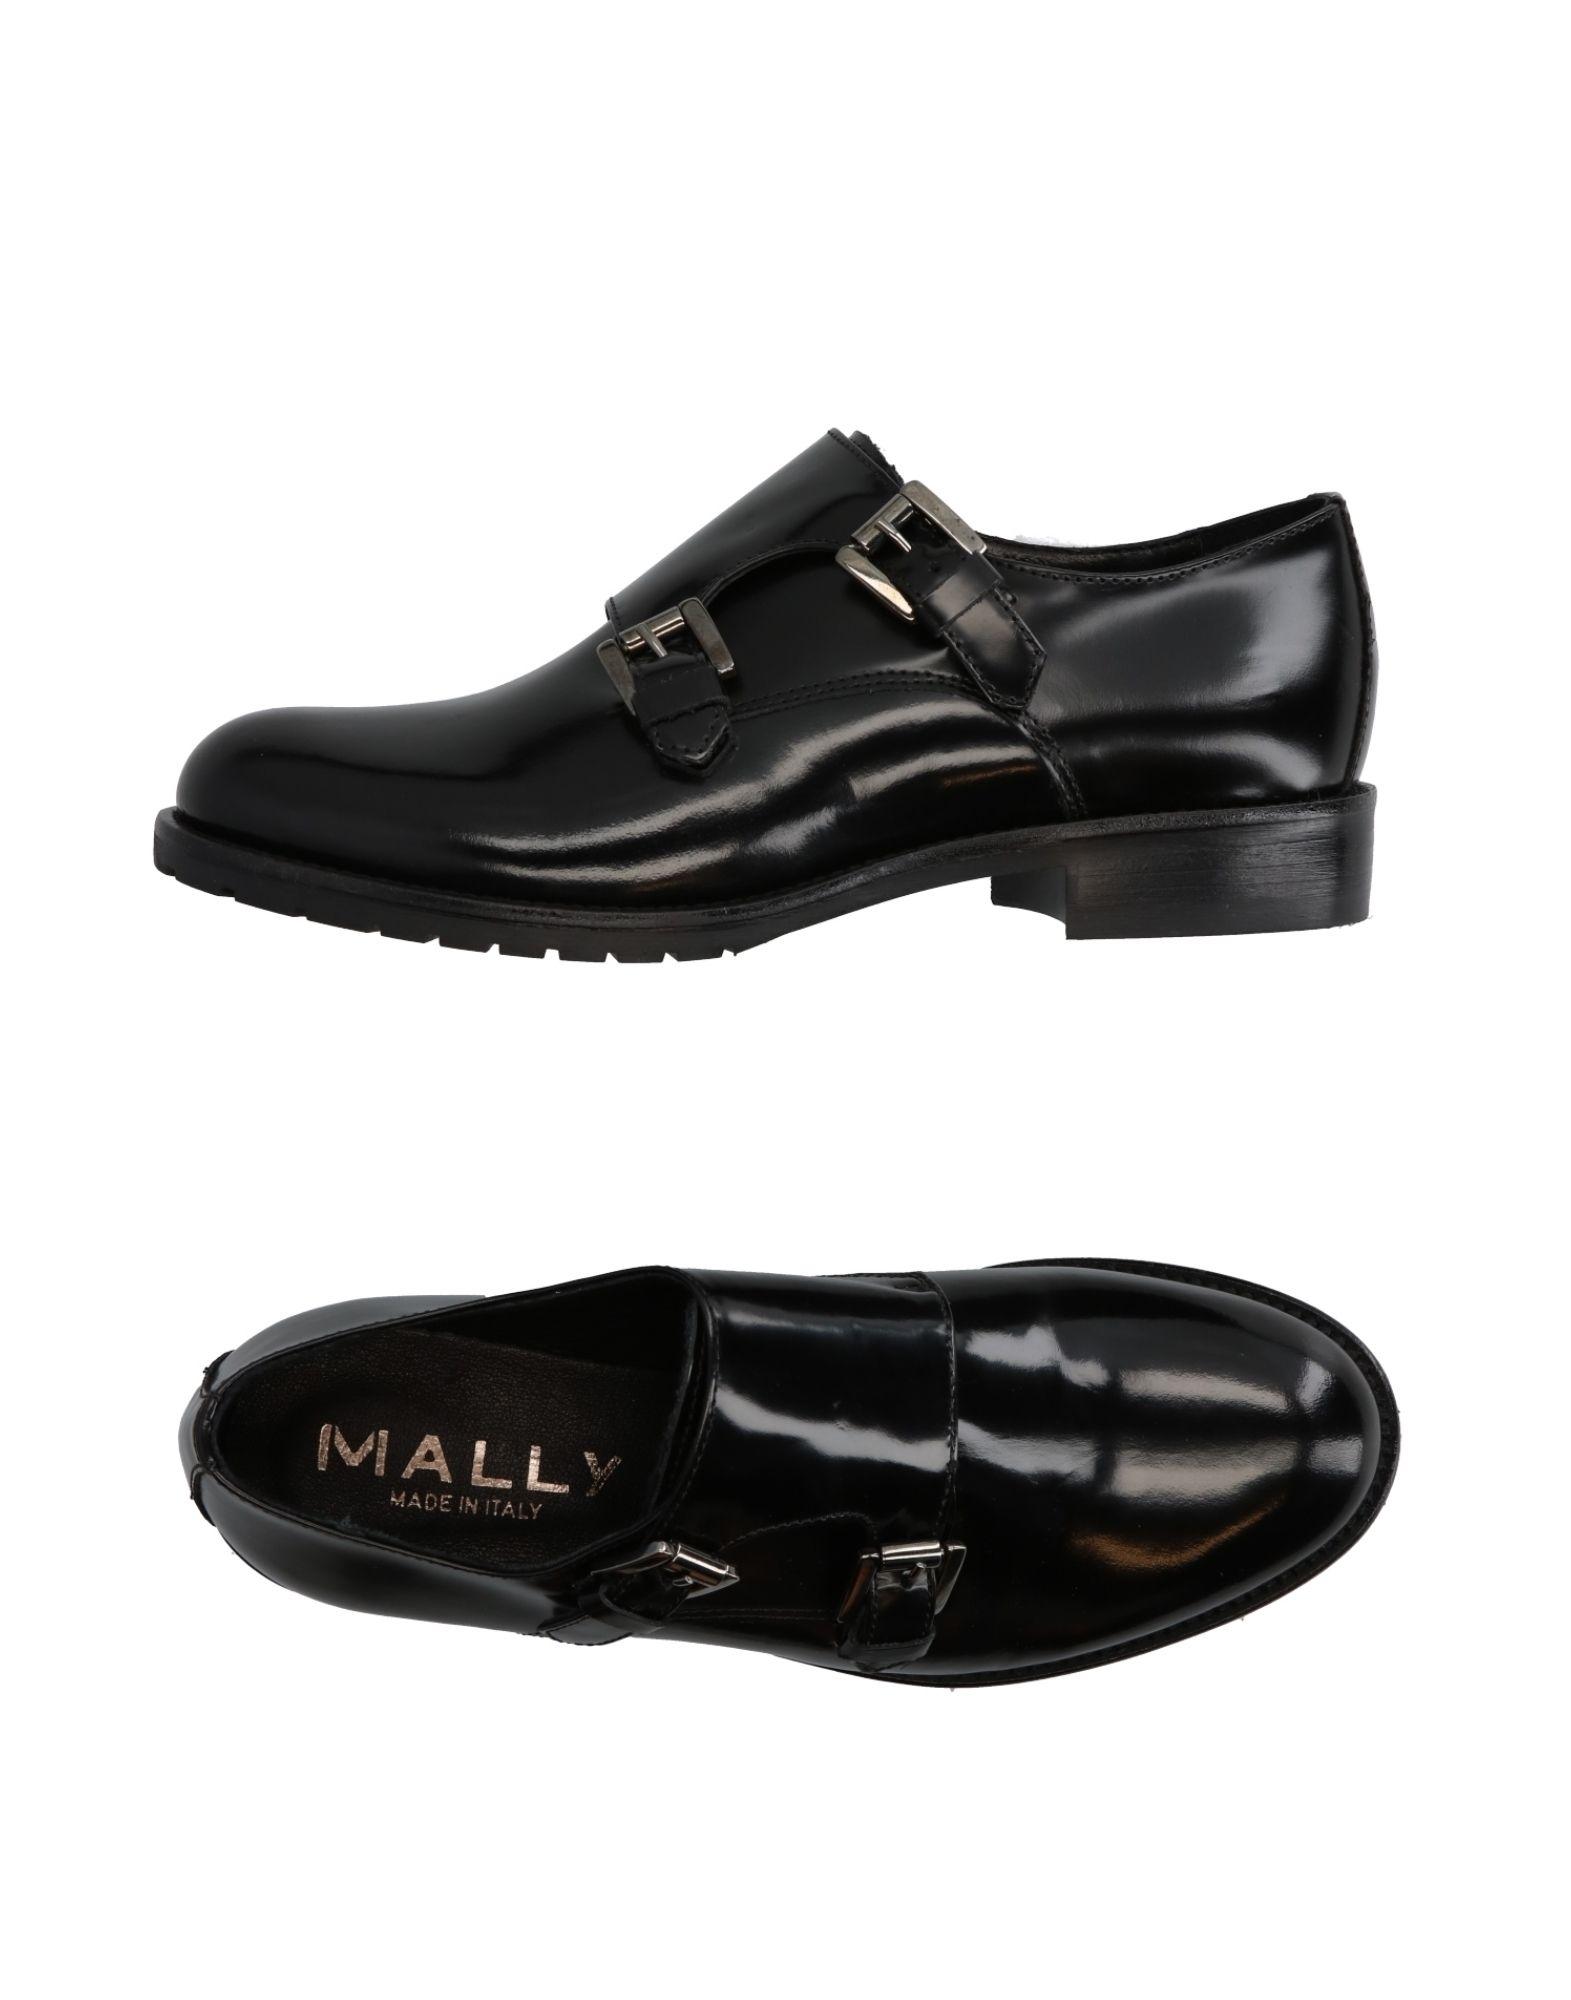 Moda Mocassino Mally Mally Mocassino Donna - 11305371KO b07f37